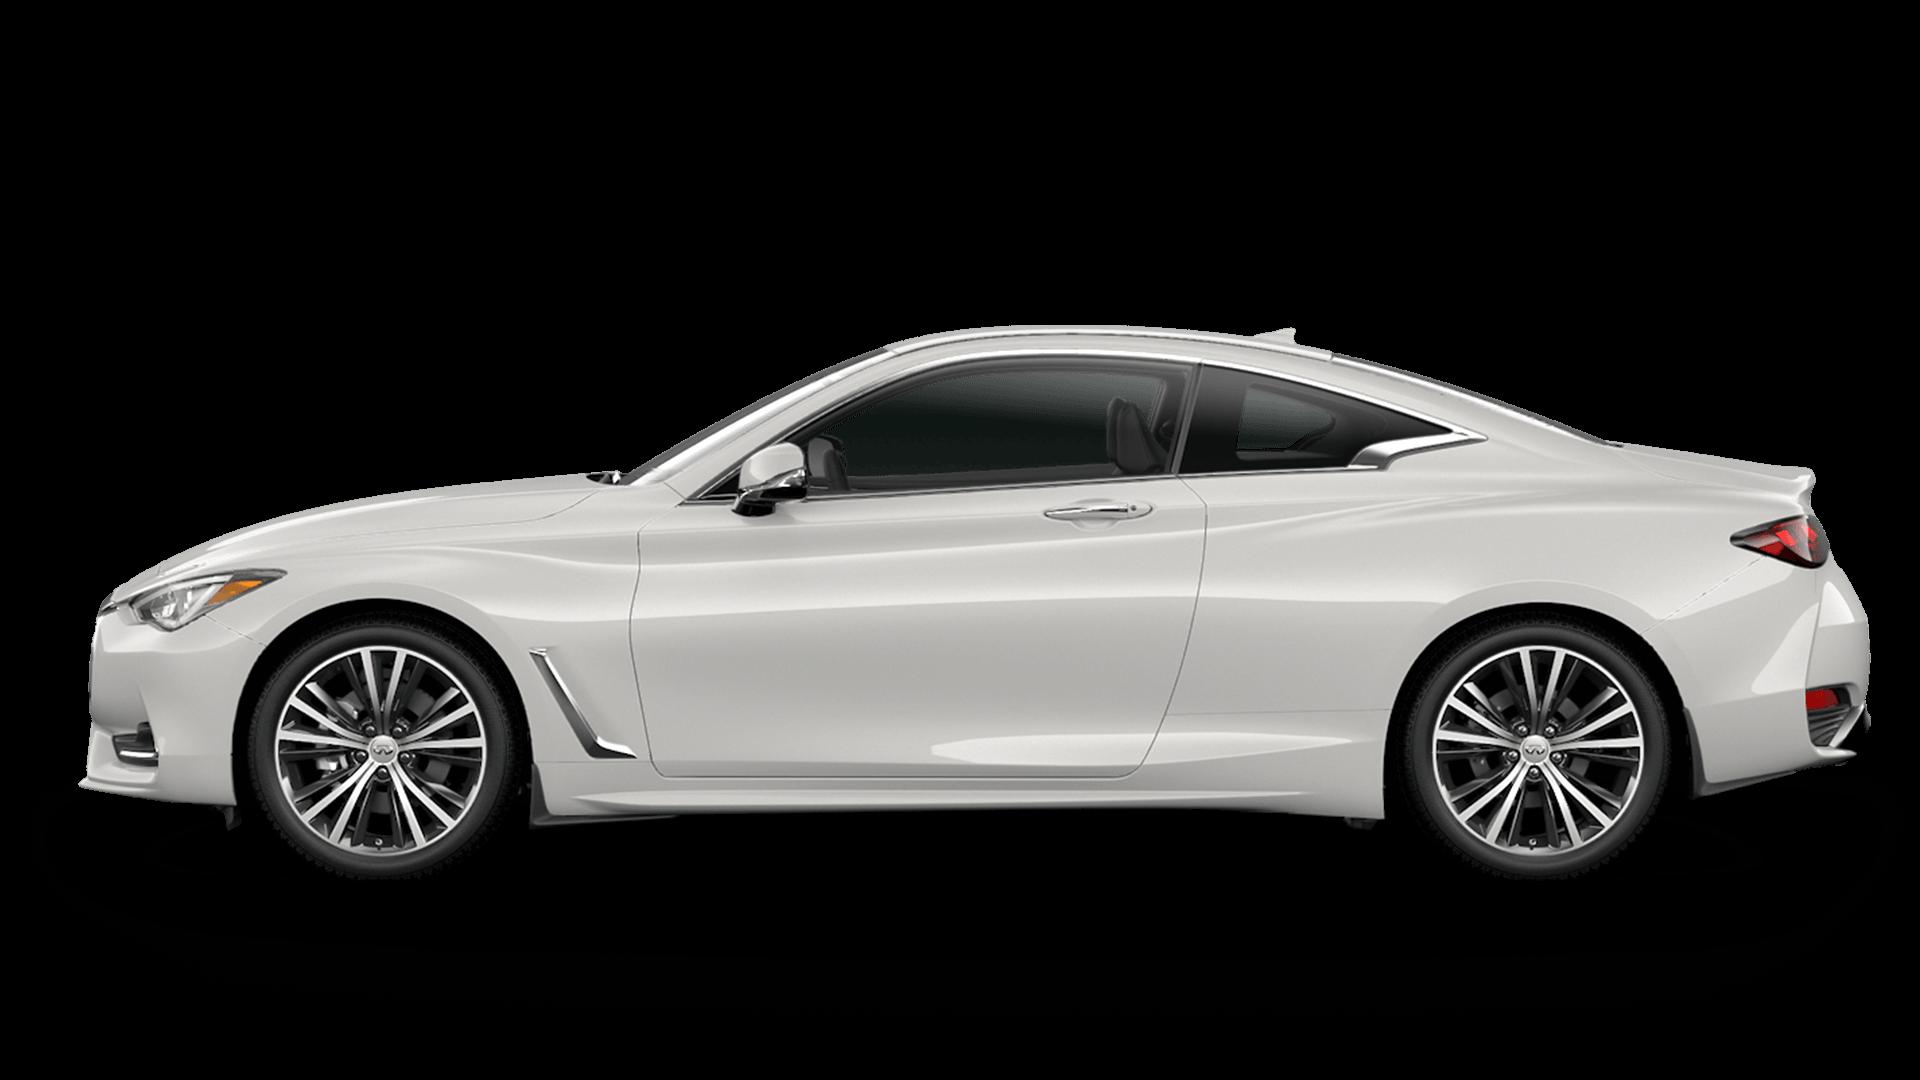 New 2021 Infiniti Q60 Pure RWD model for sale at Oxnard Infiniti dealership near Thousand Oaks, CA